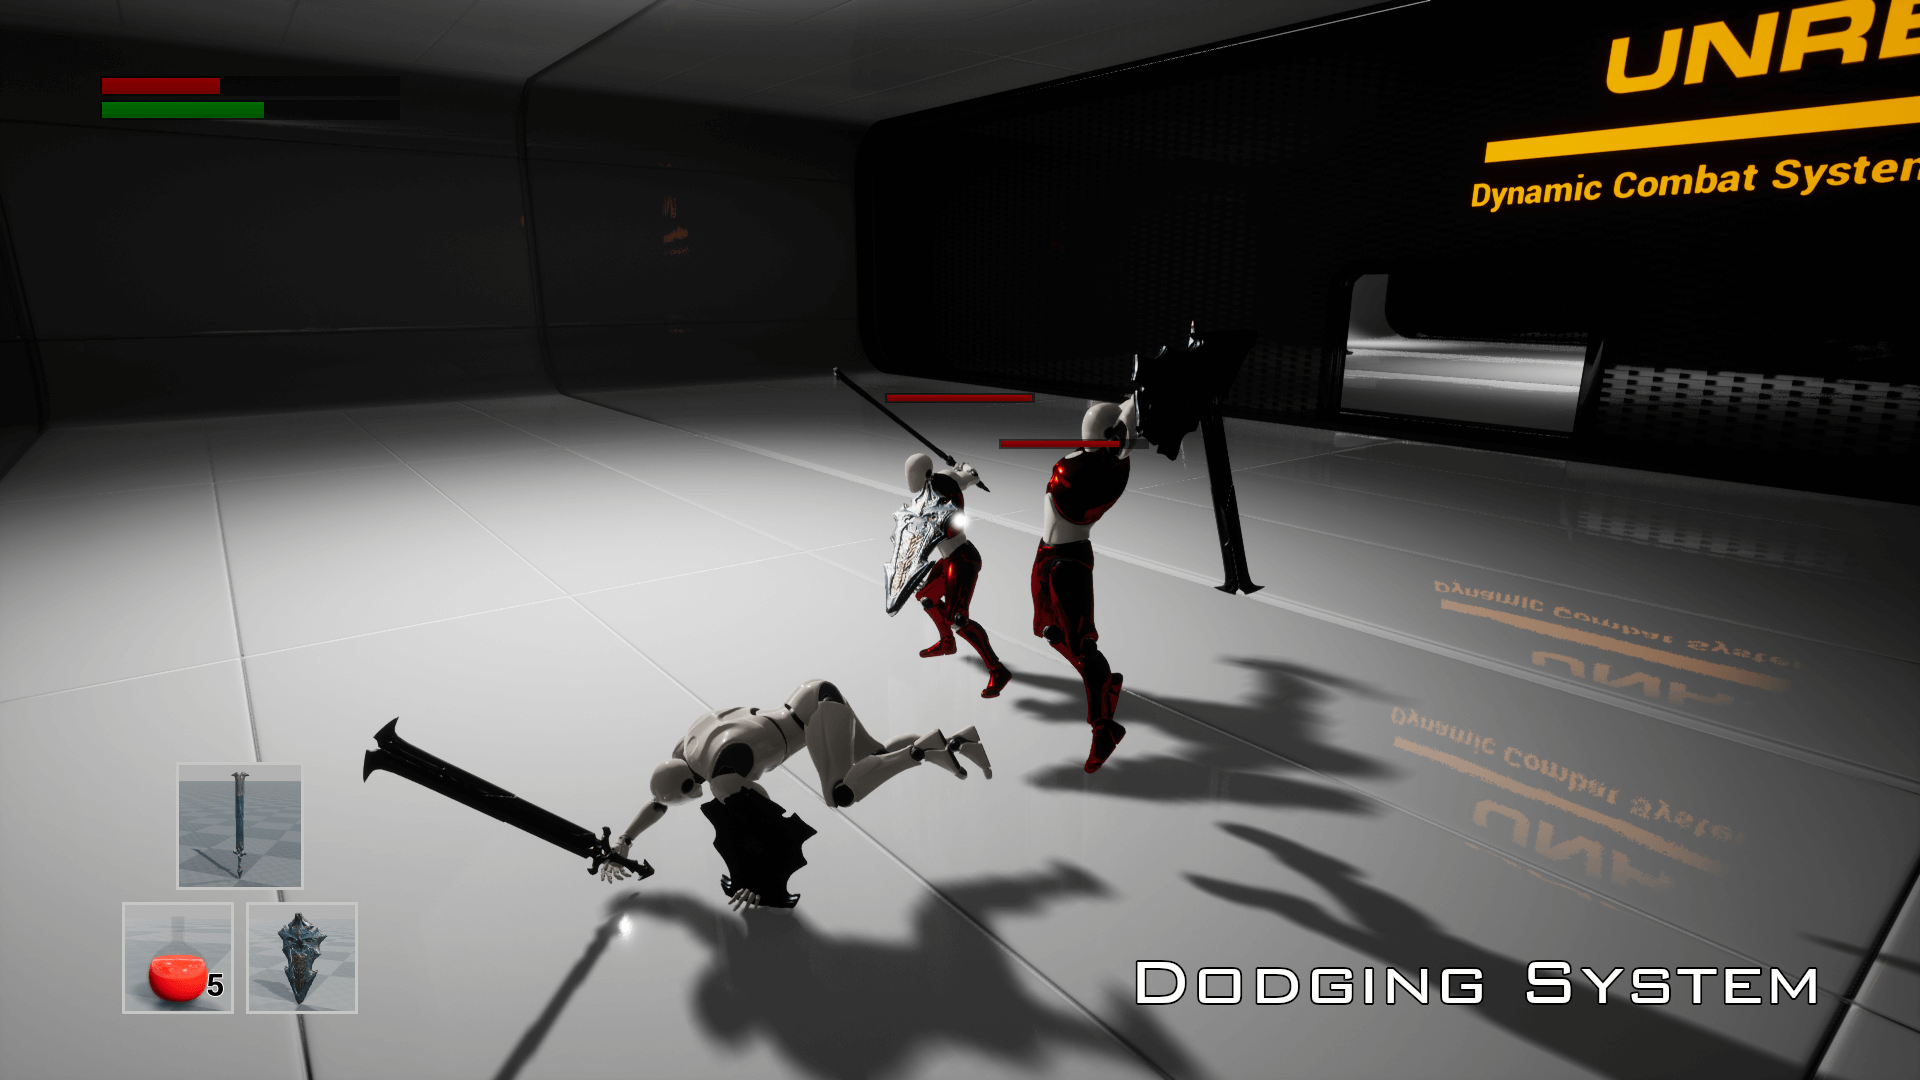 UnrealEngine Dynamic Combat System - Magic